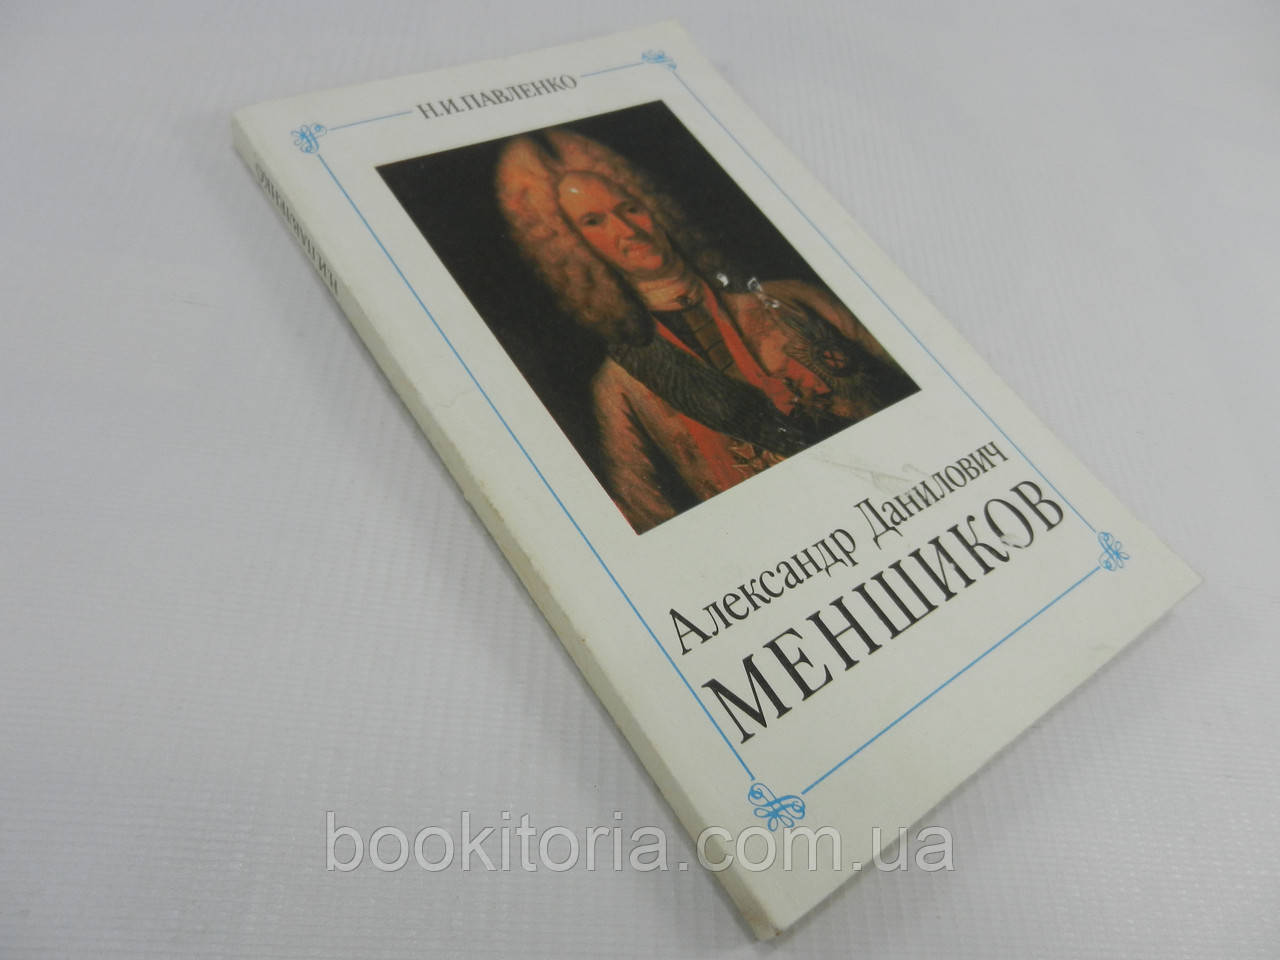 Павленко Н. Александр Данилович Меншиков (б/у).